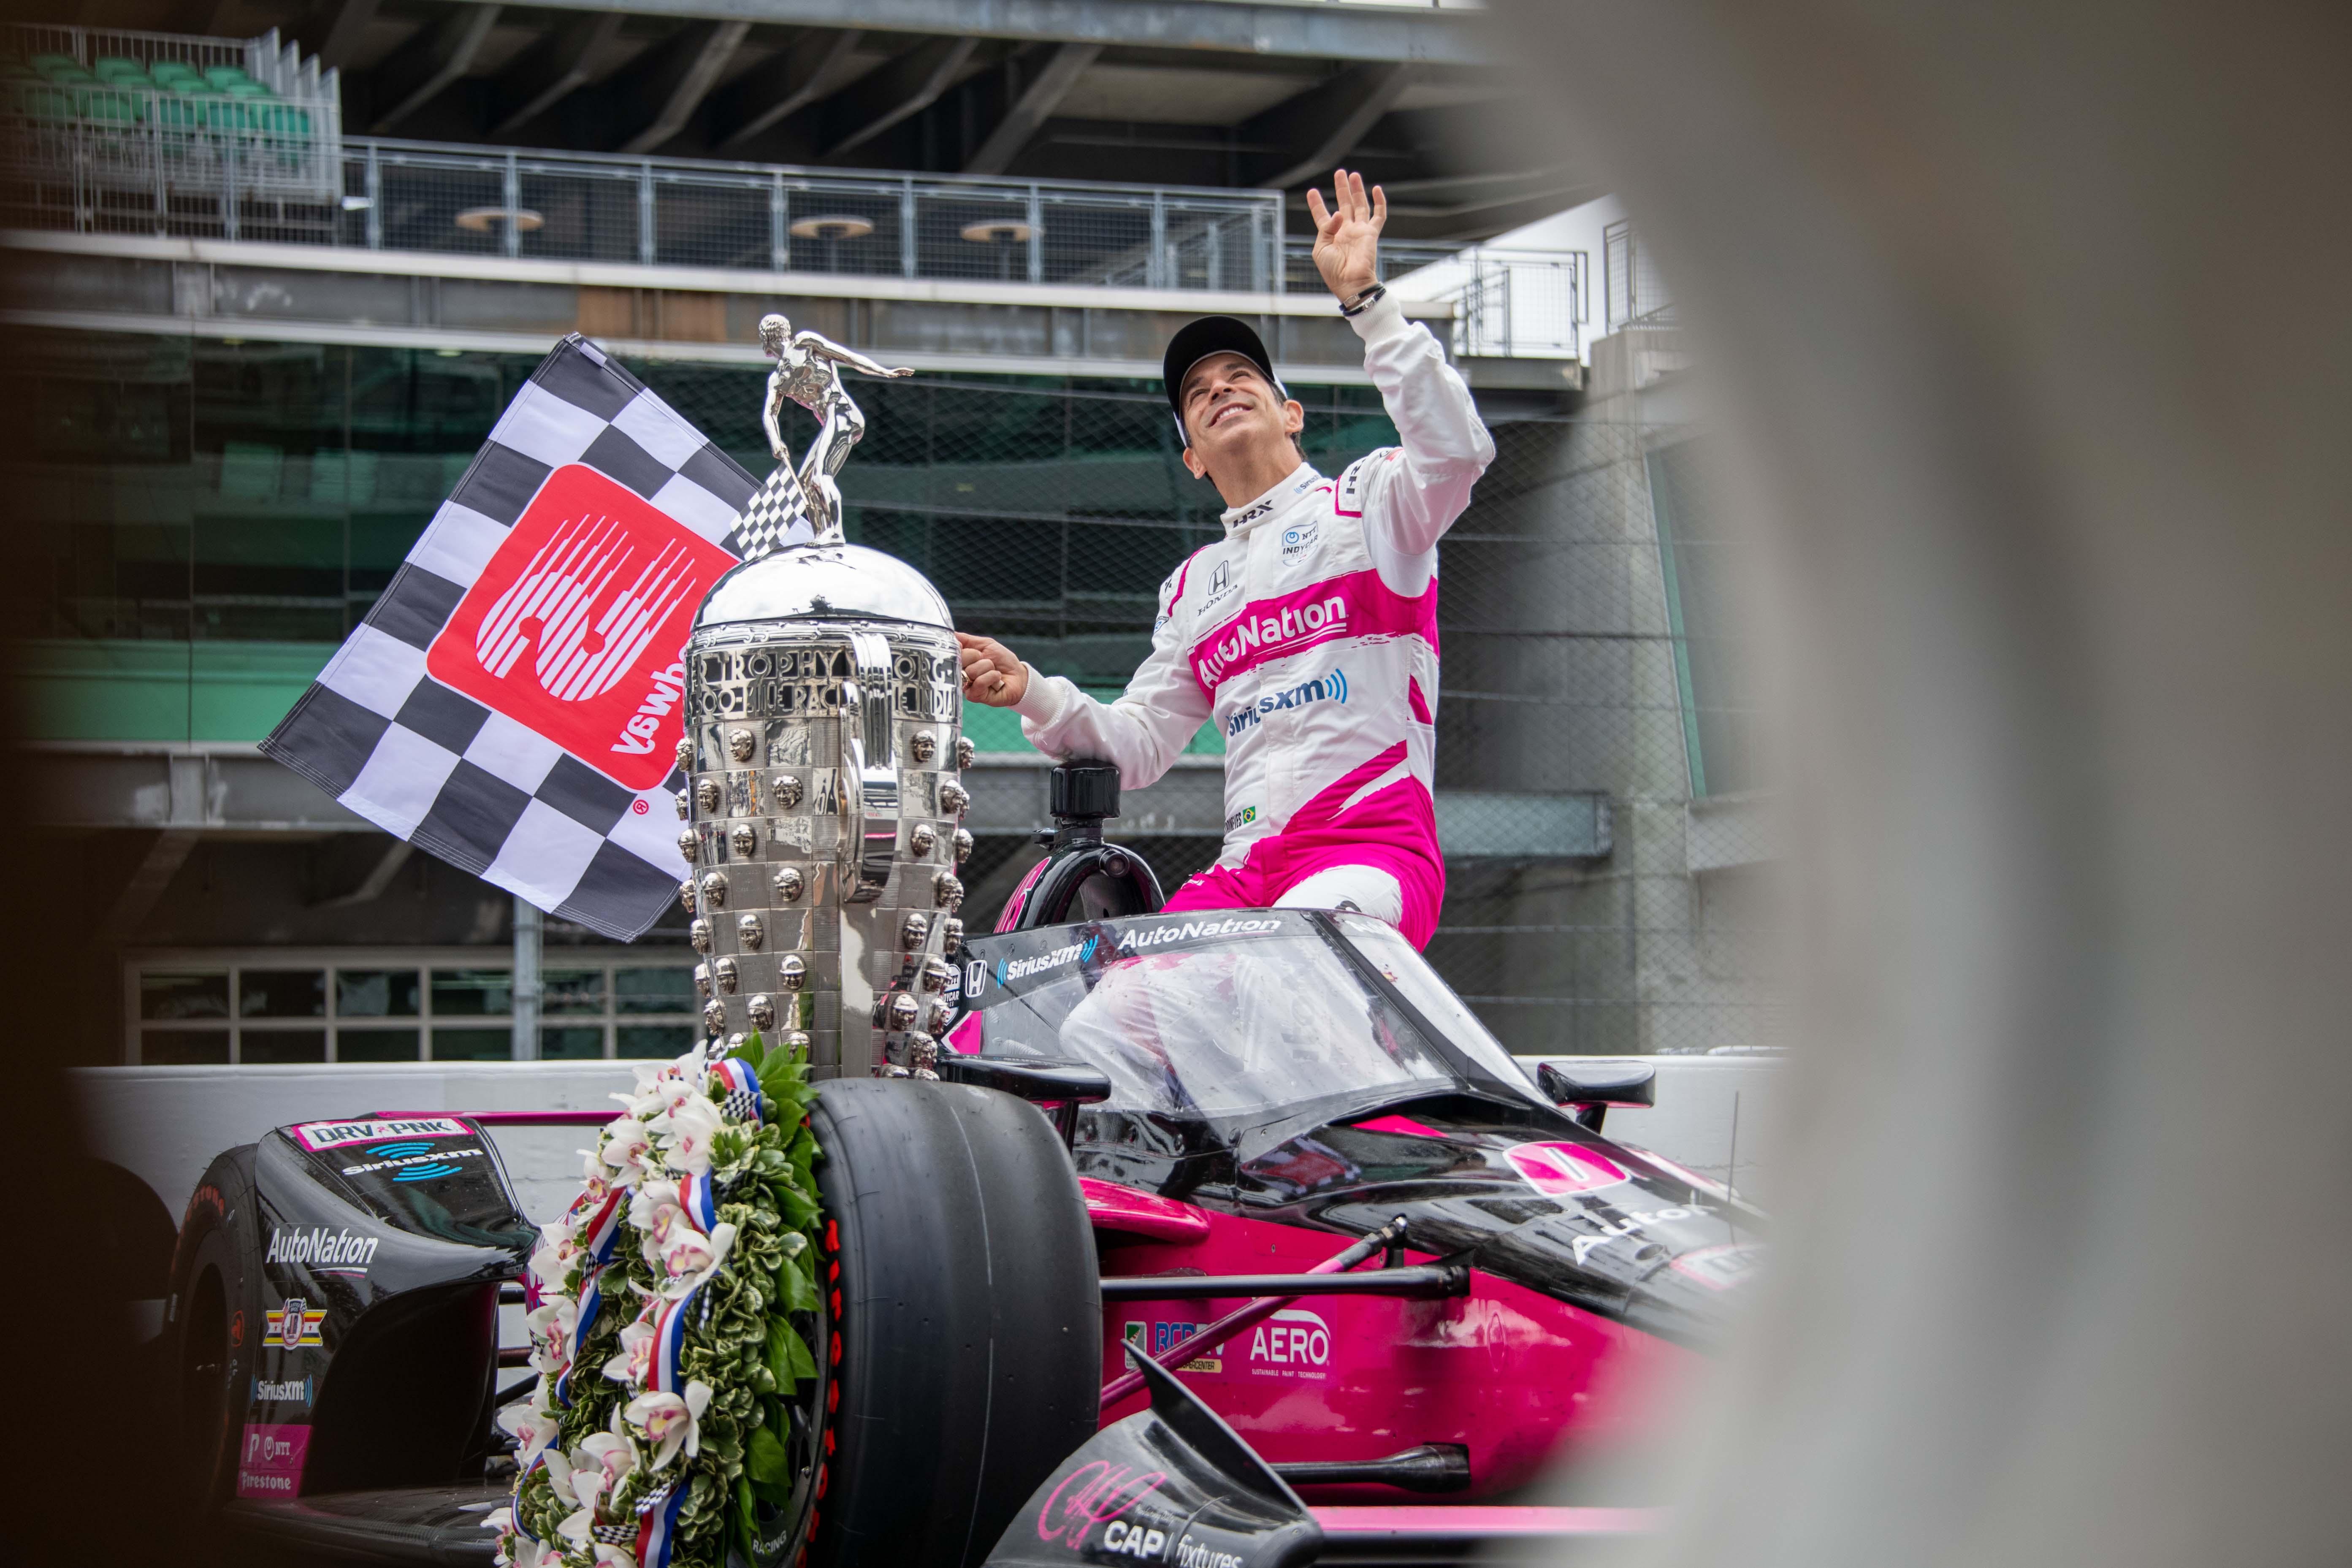 Helio Castroneves - 2021 Indy 500 winner